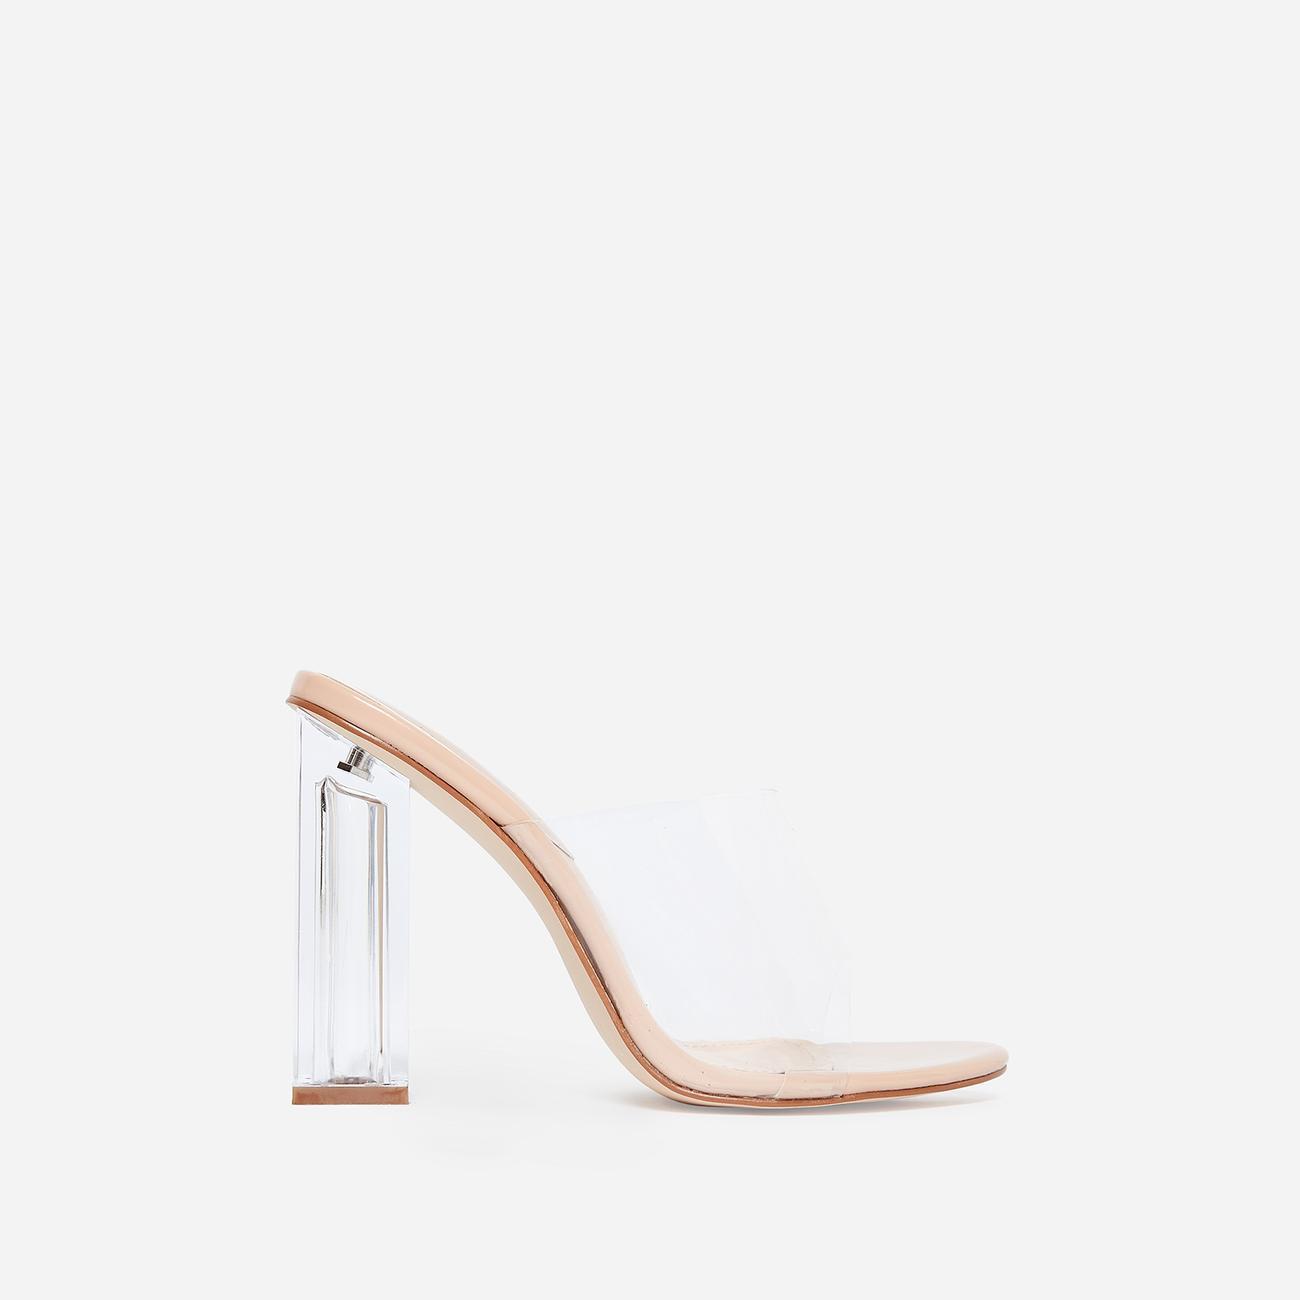 Fusion Peep Toe Perspex Block Clear Heel Mule In Nude Patent Image 2